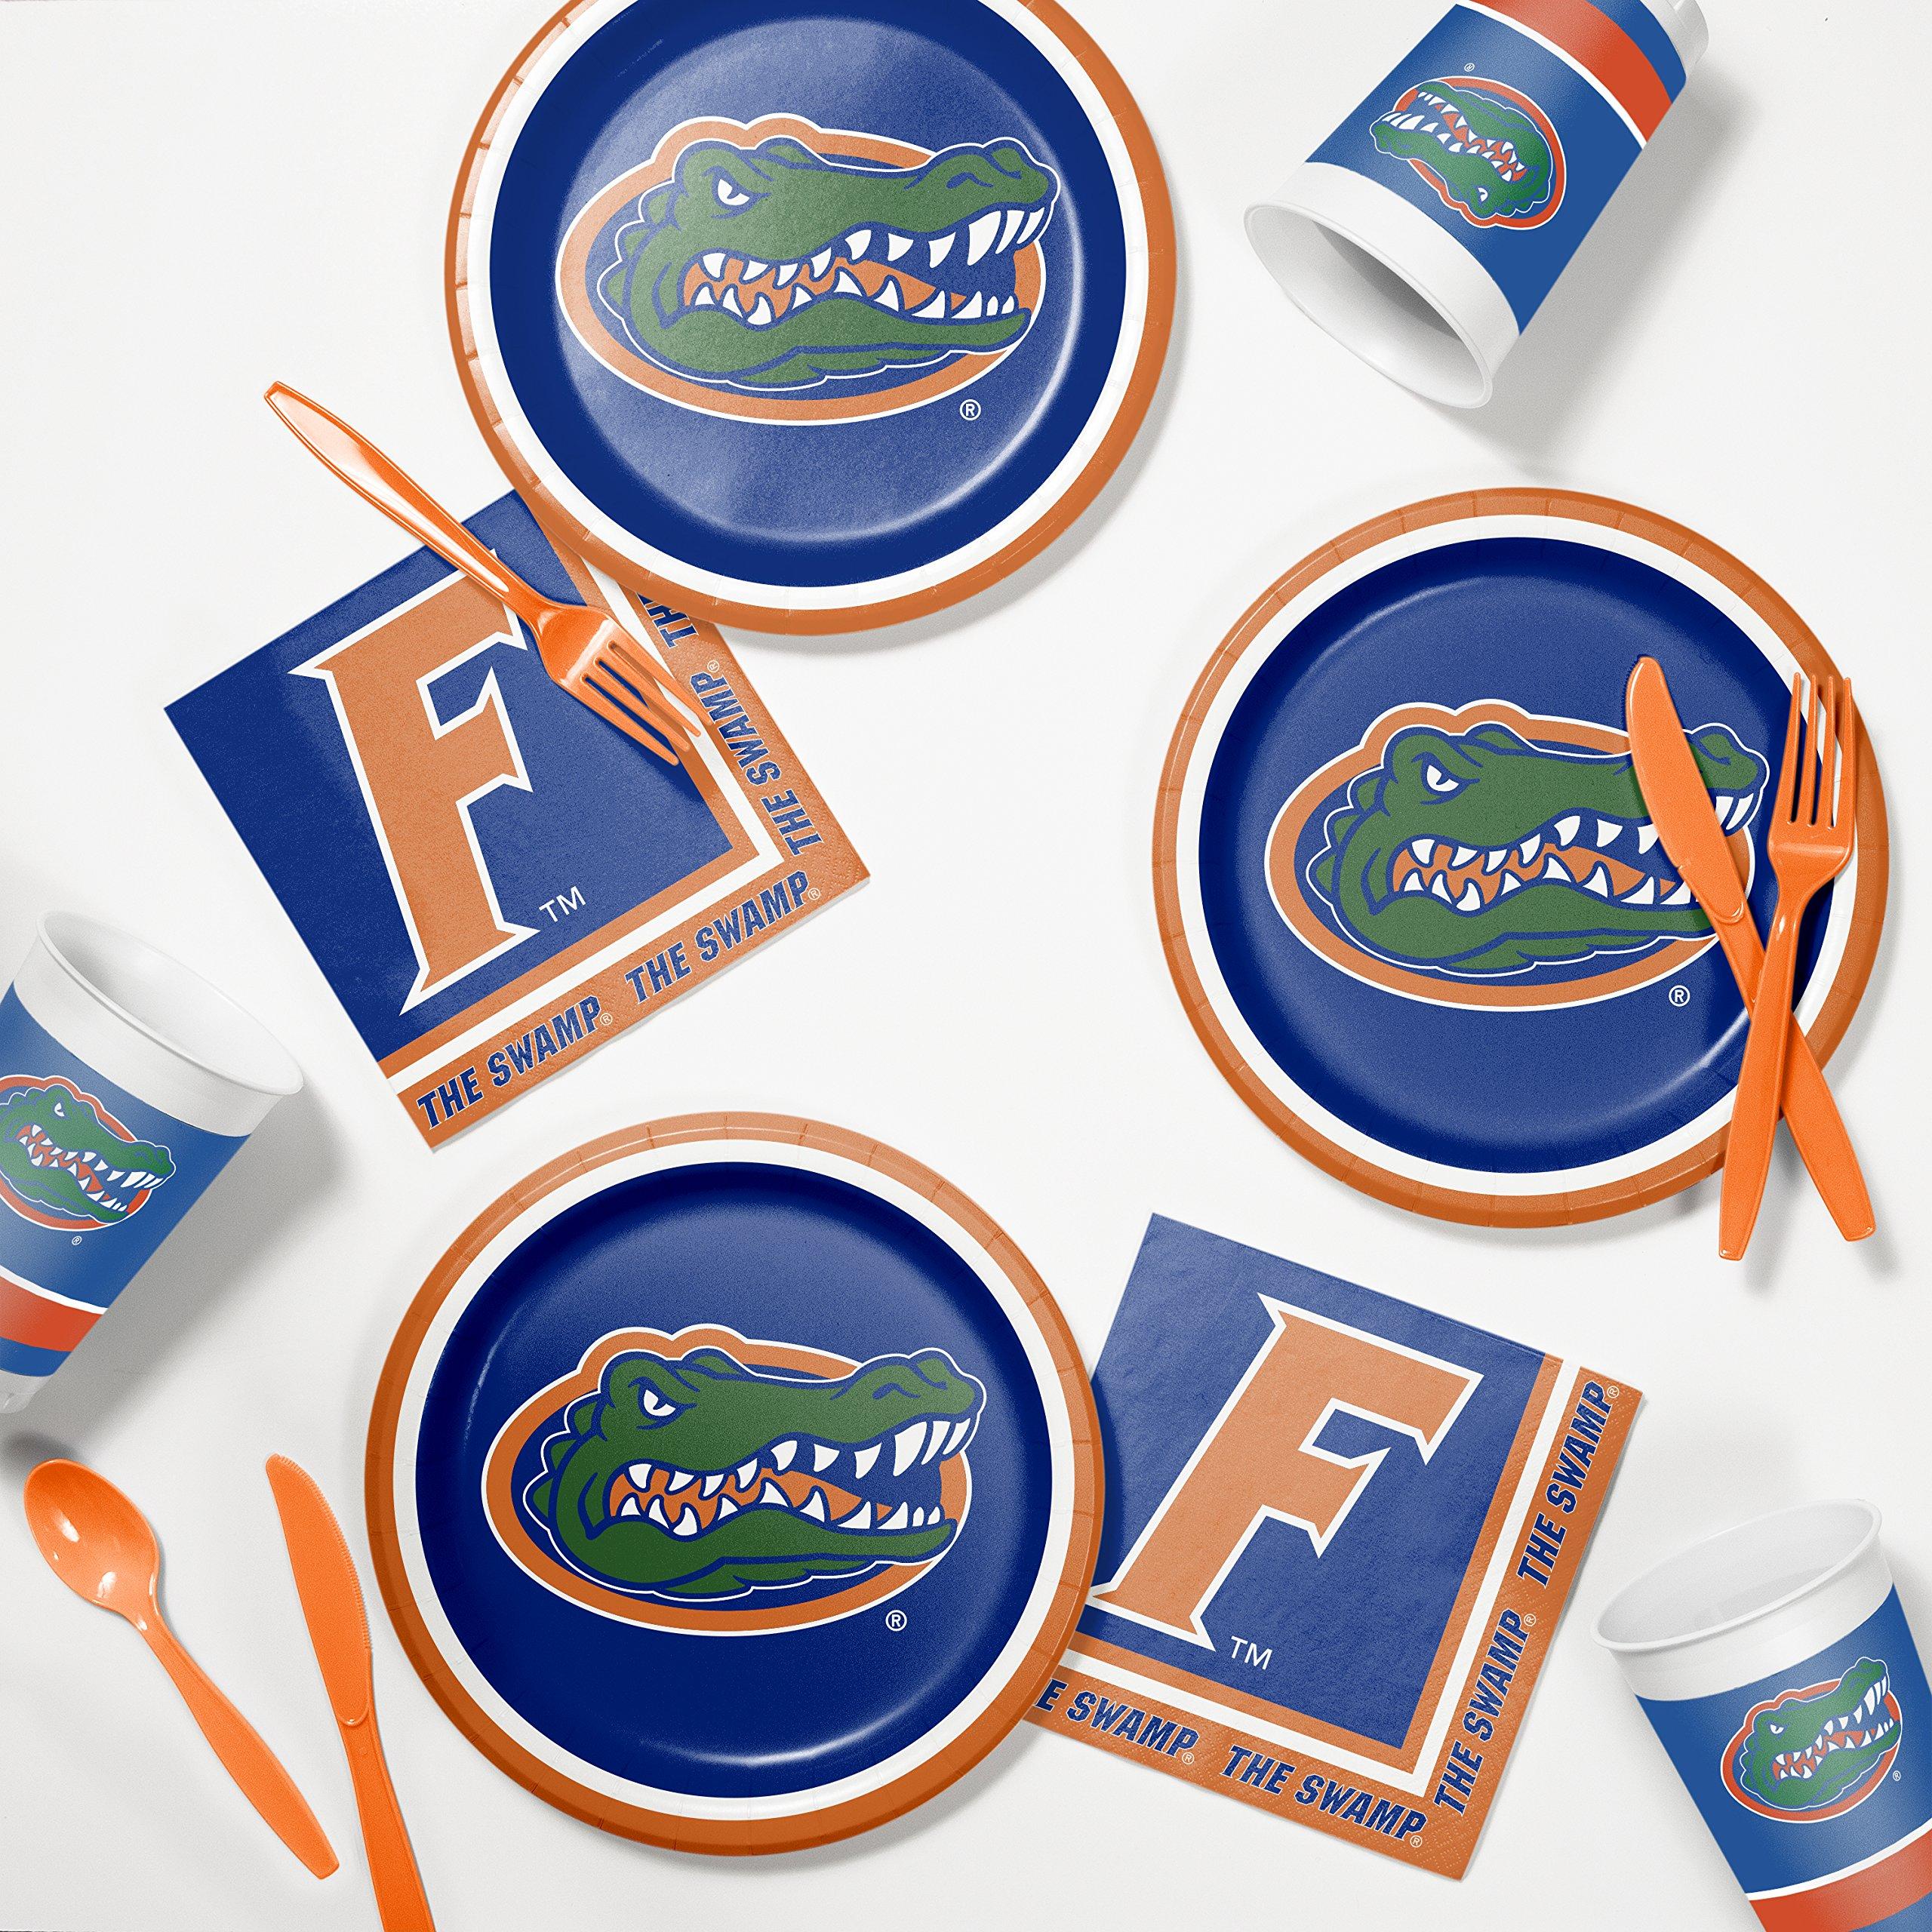 University of Florida Tailgating Kit